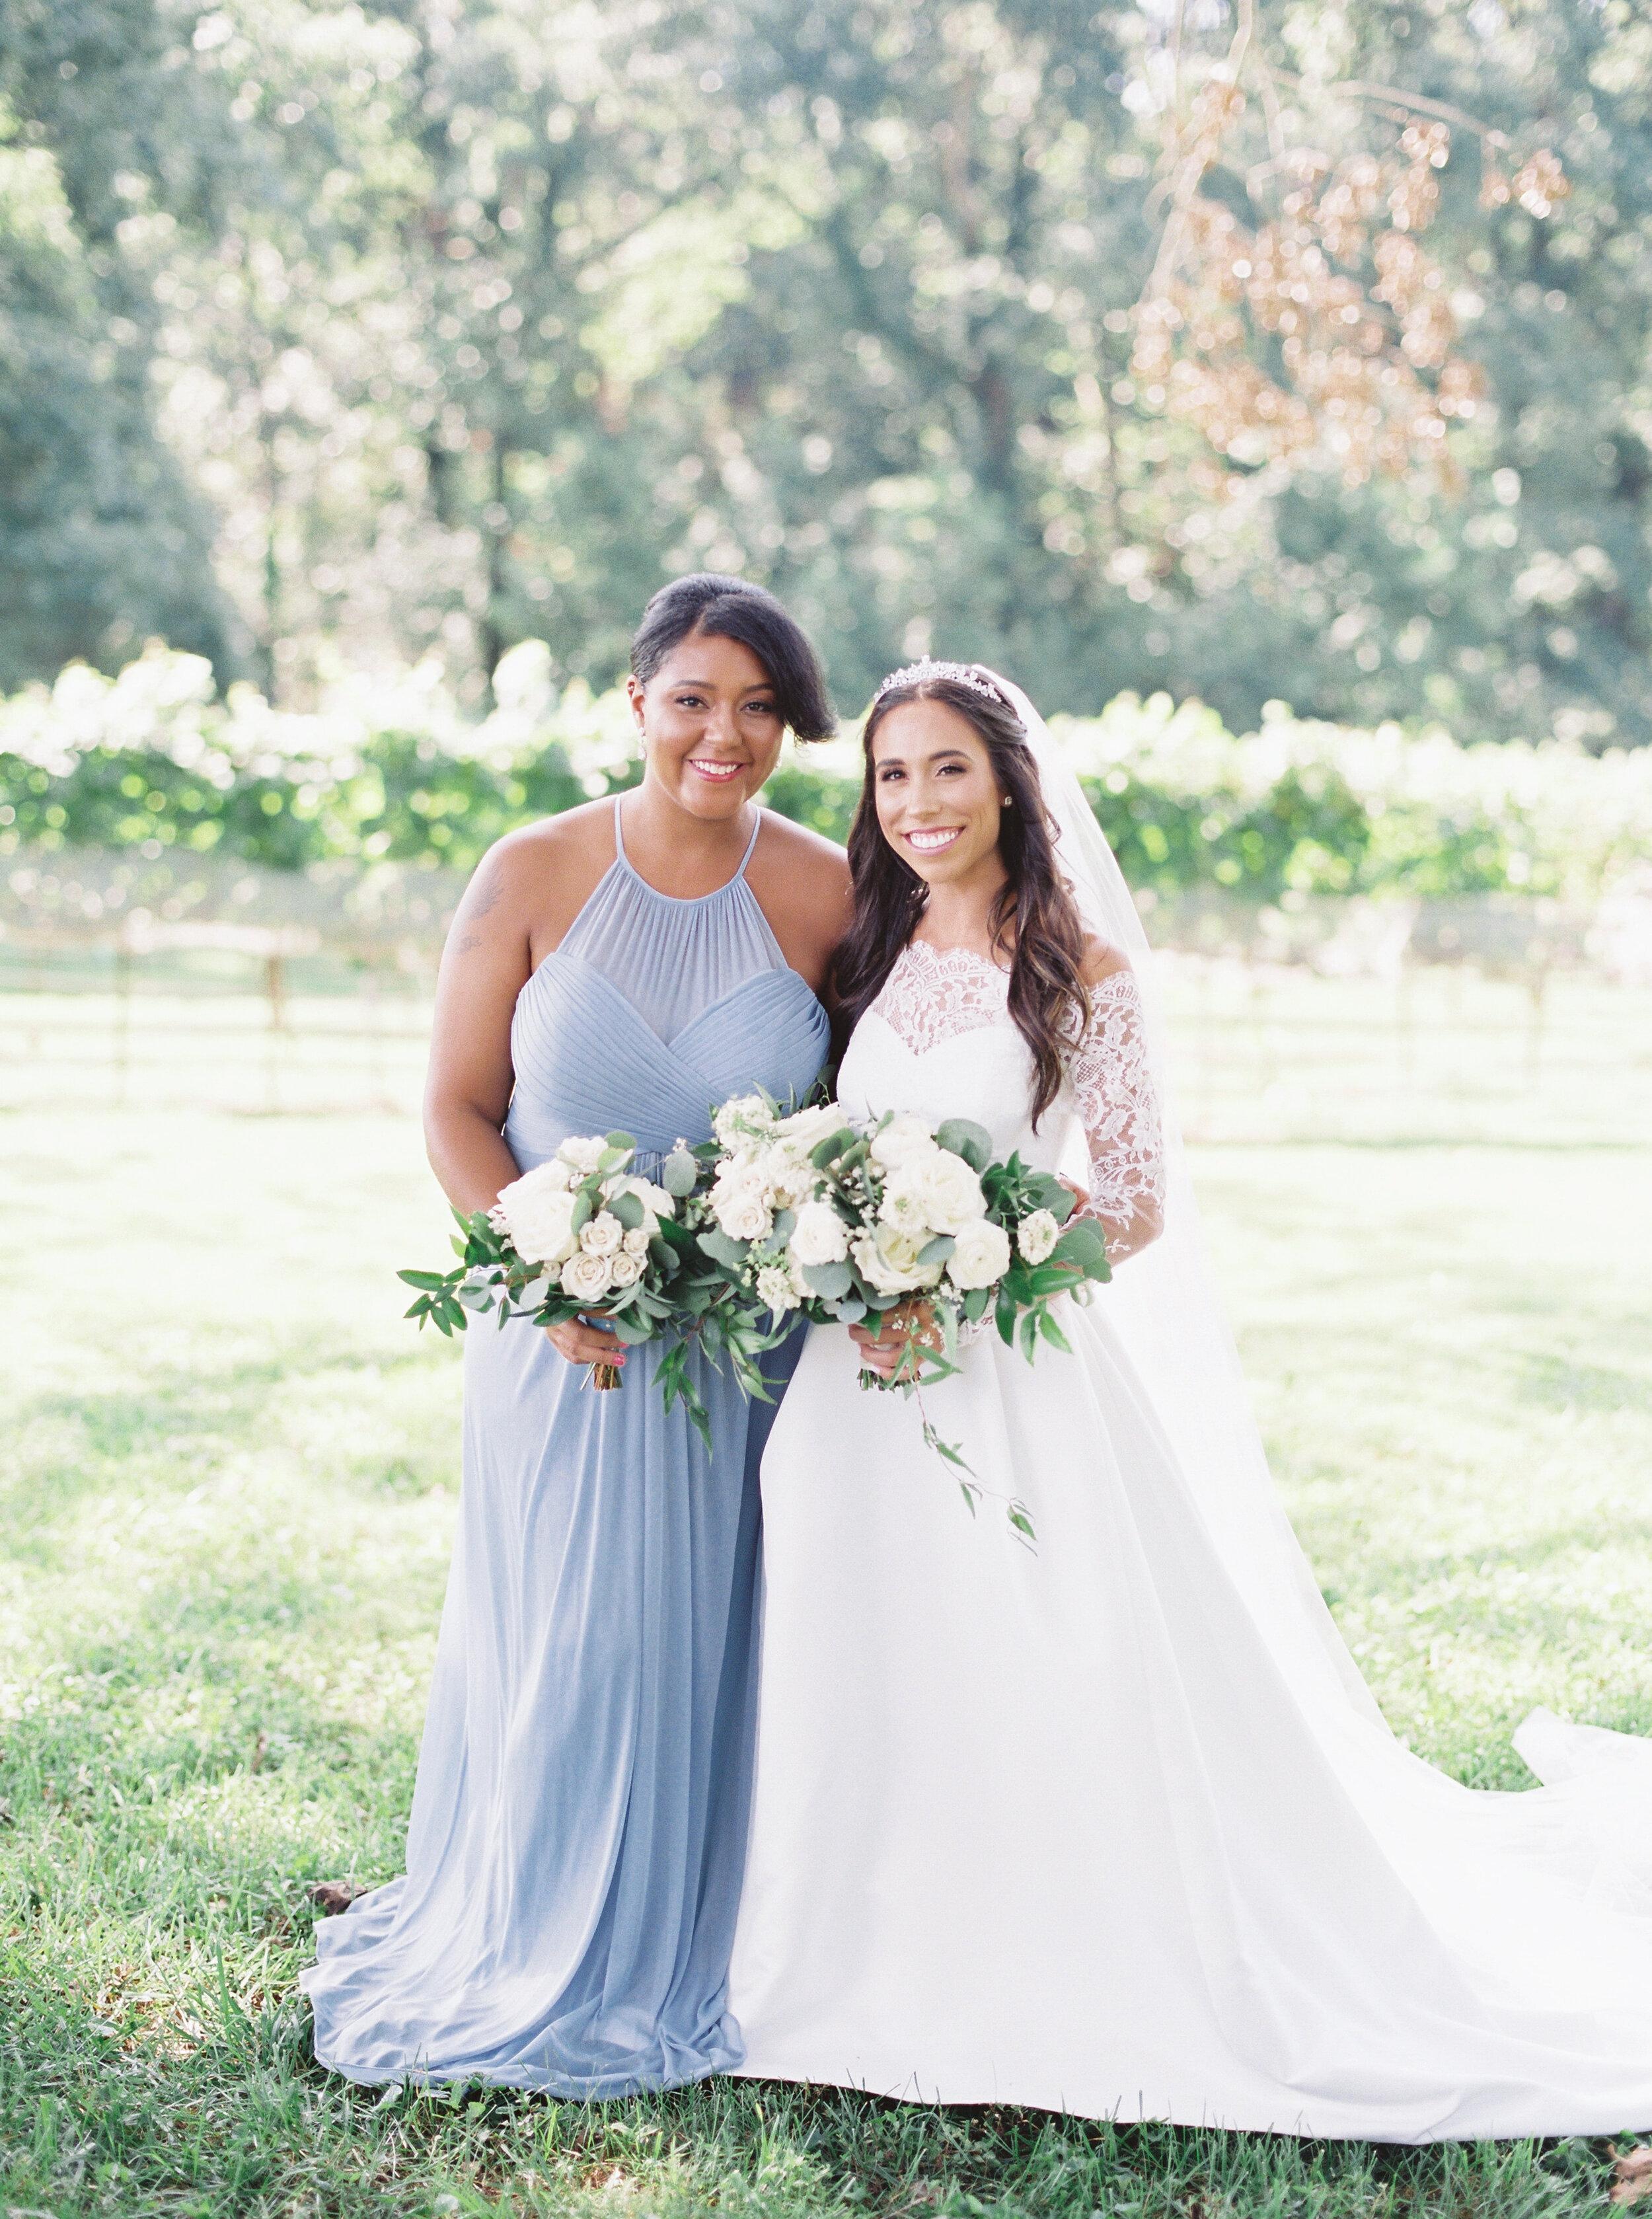 montaluce-winery-wedding-photography-dahlonega-hannah-forsberg-atlanta-film-wedding-photographer1.JPG